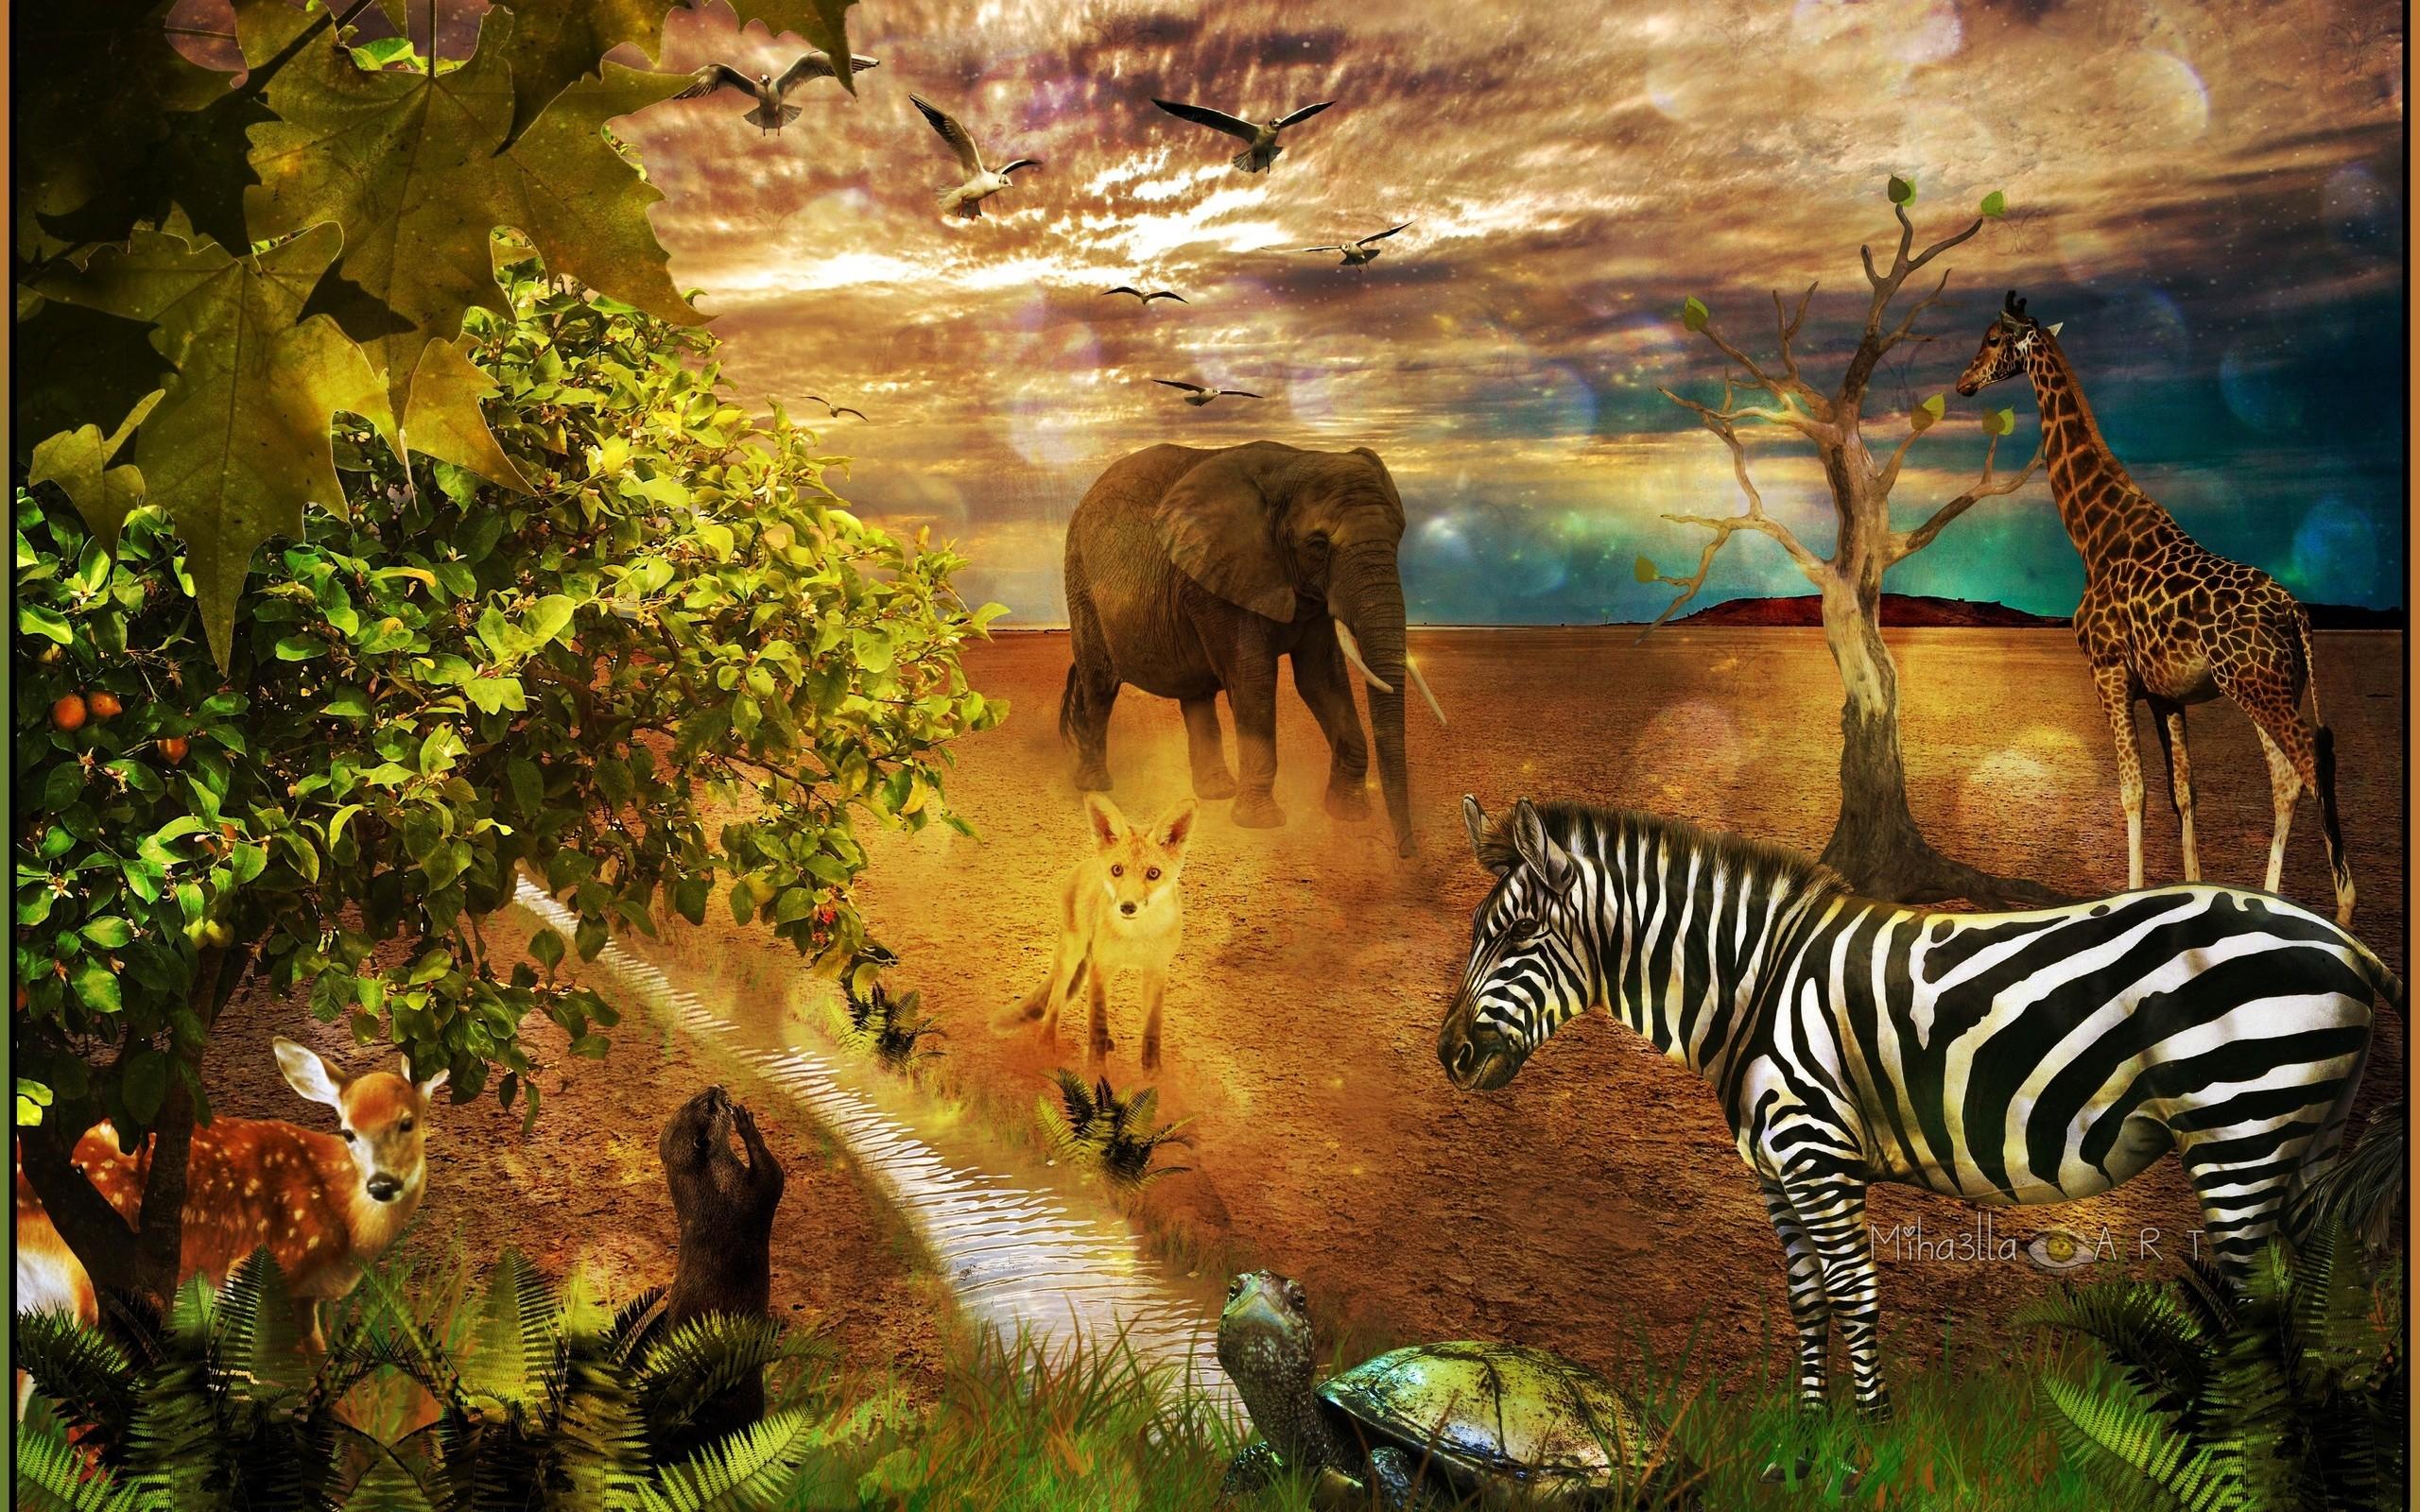 elephant art wallpaper  68  images